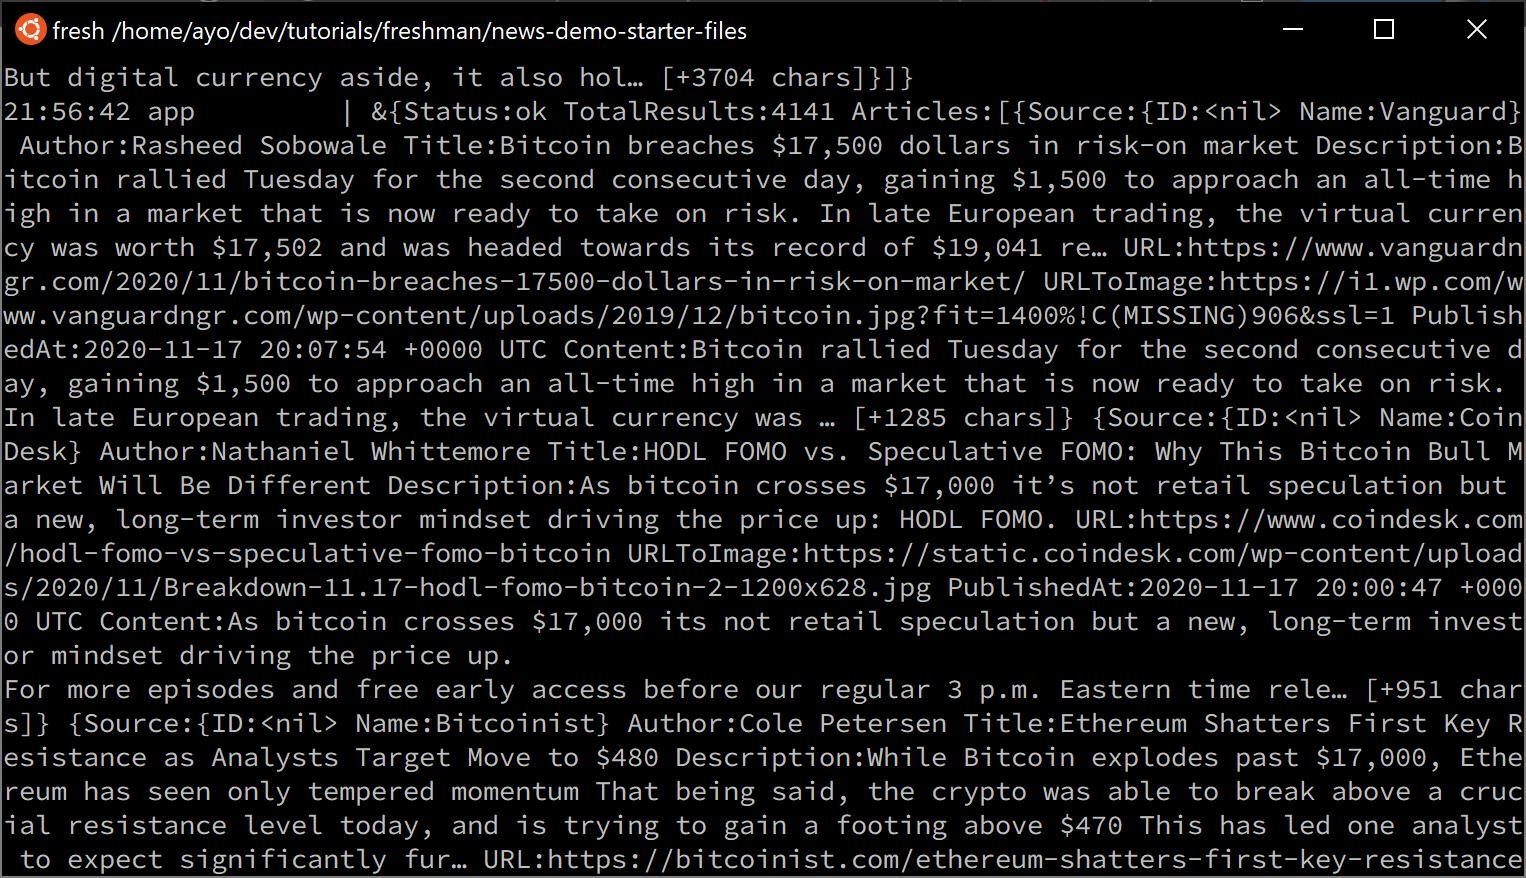 Ubuntu terminal showing output from NewsAPI.org